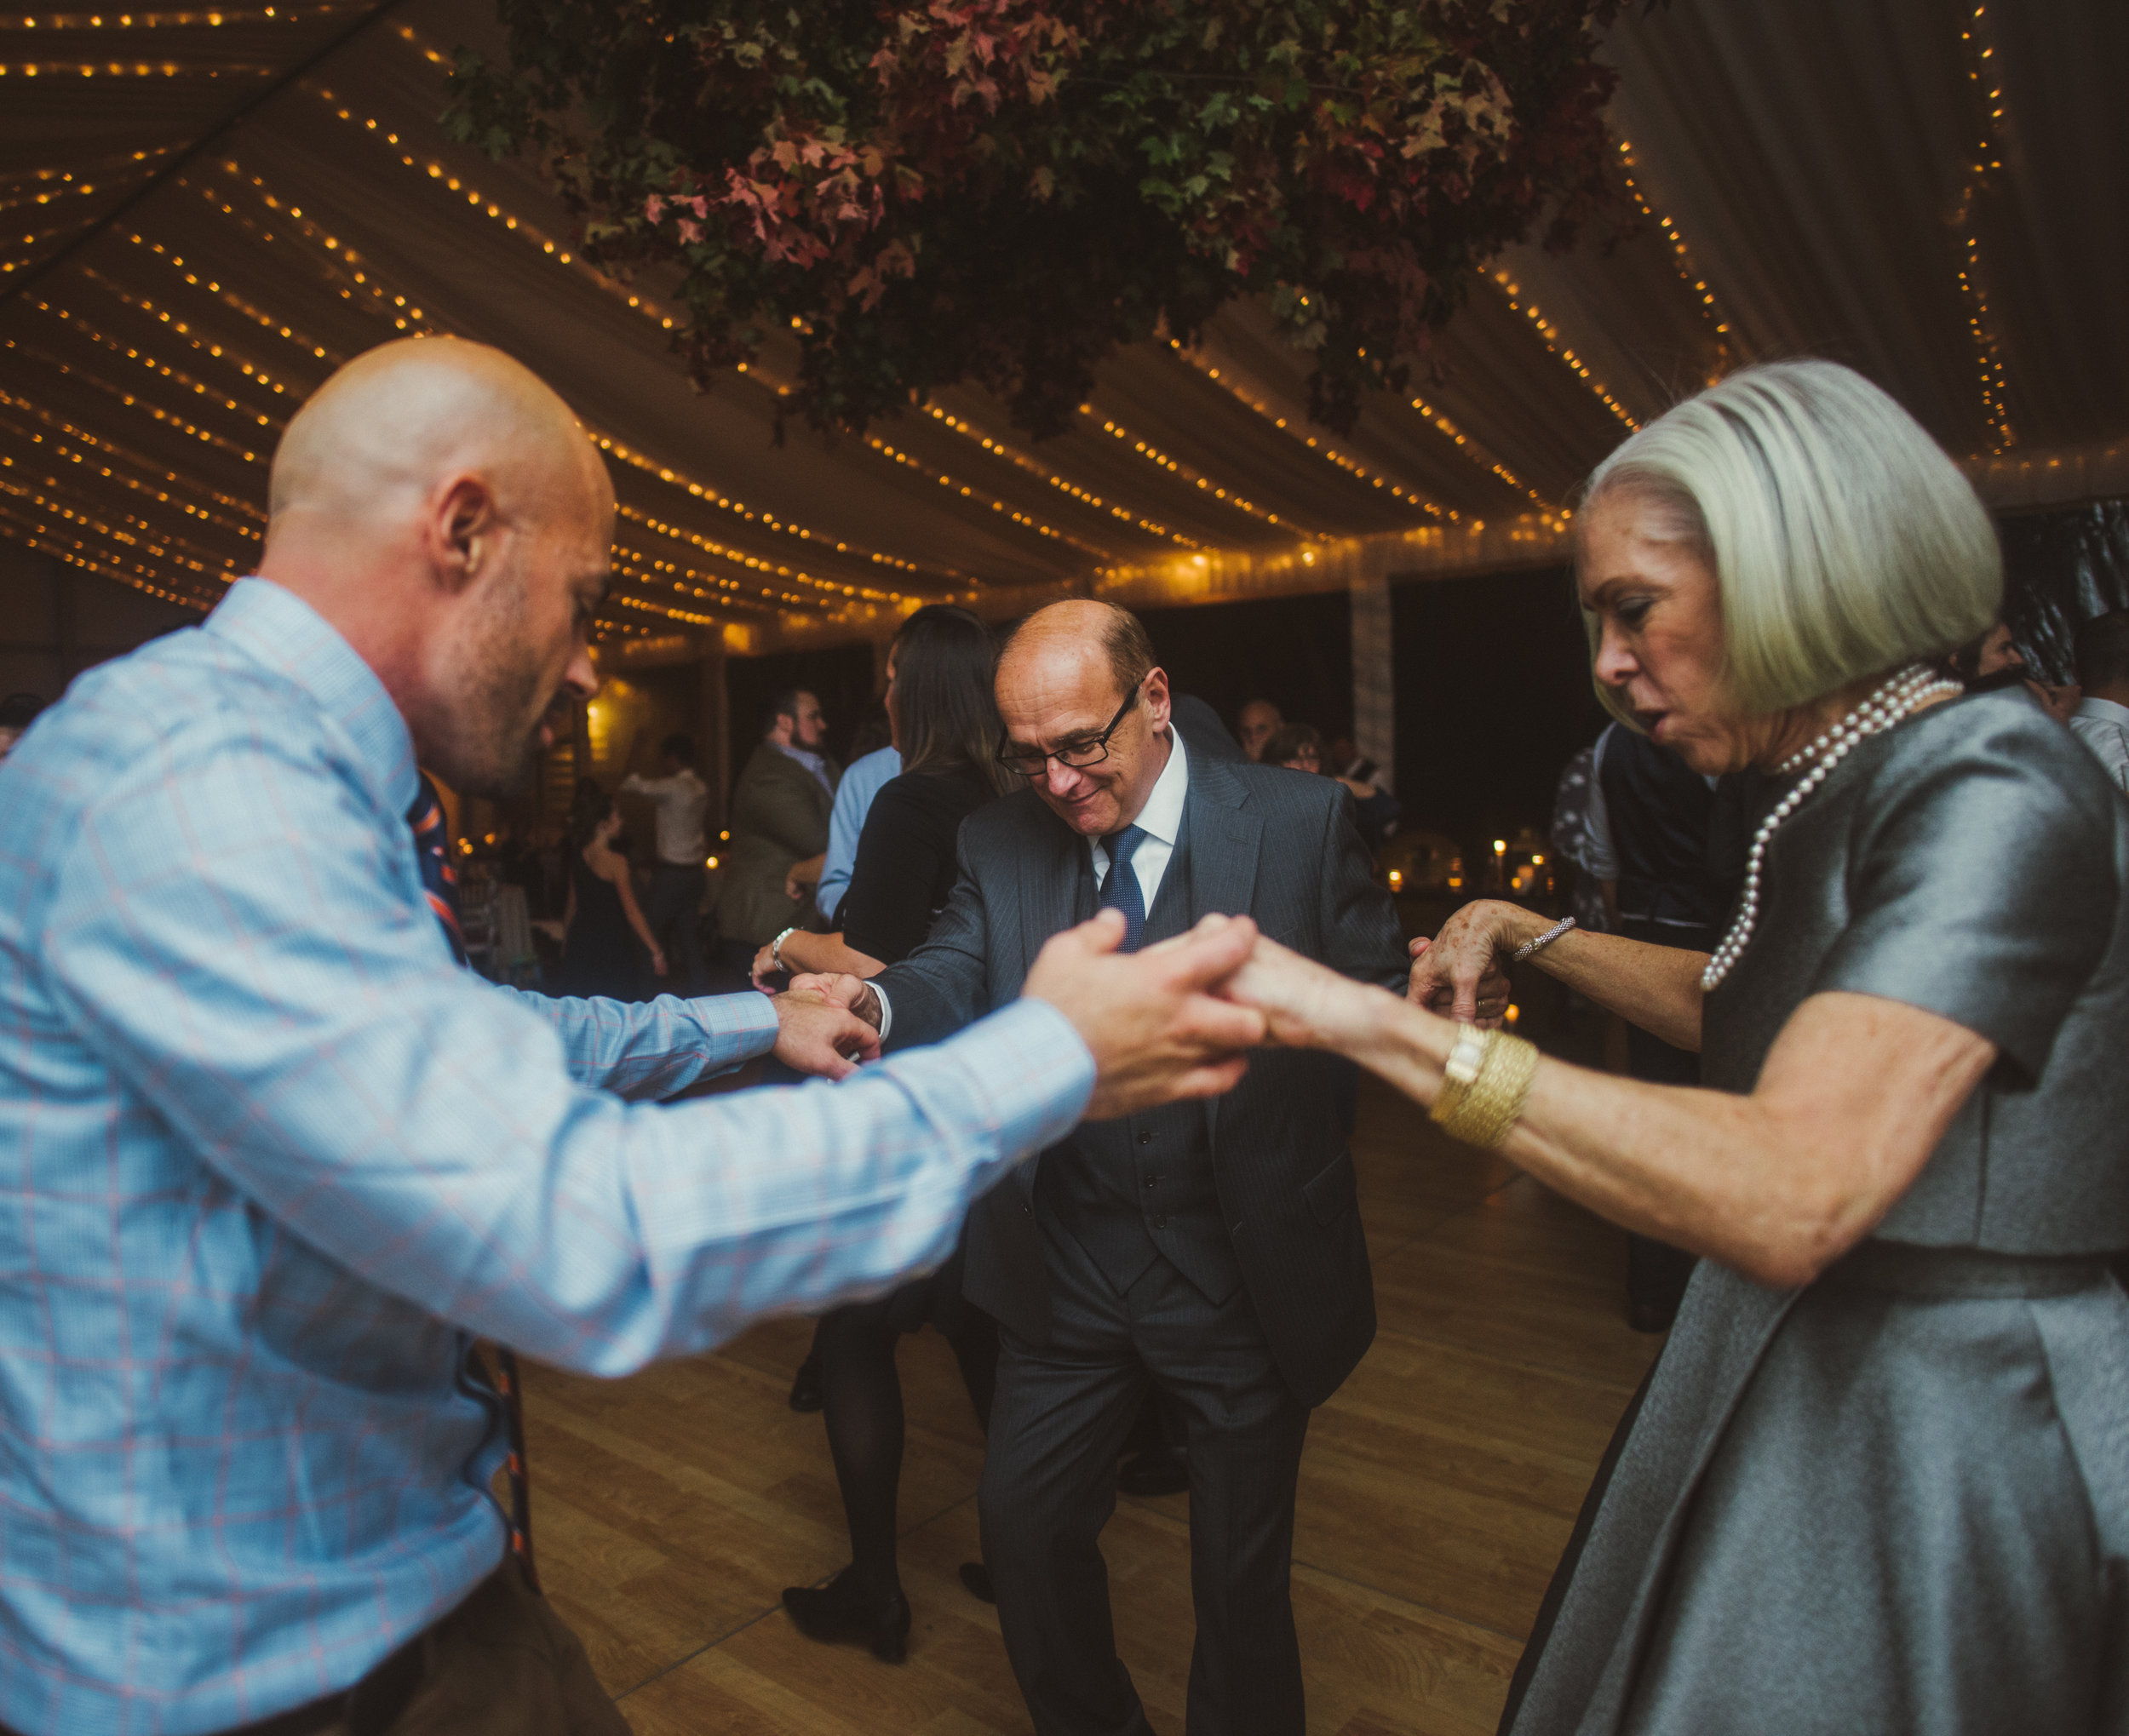 JACQUELINE & ANDREW WARSHAWER -BROOKMILL FARM FALL WEDDING - INTIMATE WEDDING PHOTOGRAPHER - TWOTWENTY by CHI-CHI AGBIM-725.jpg